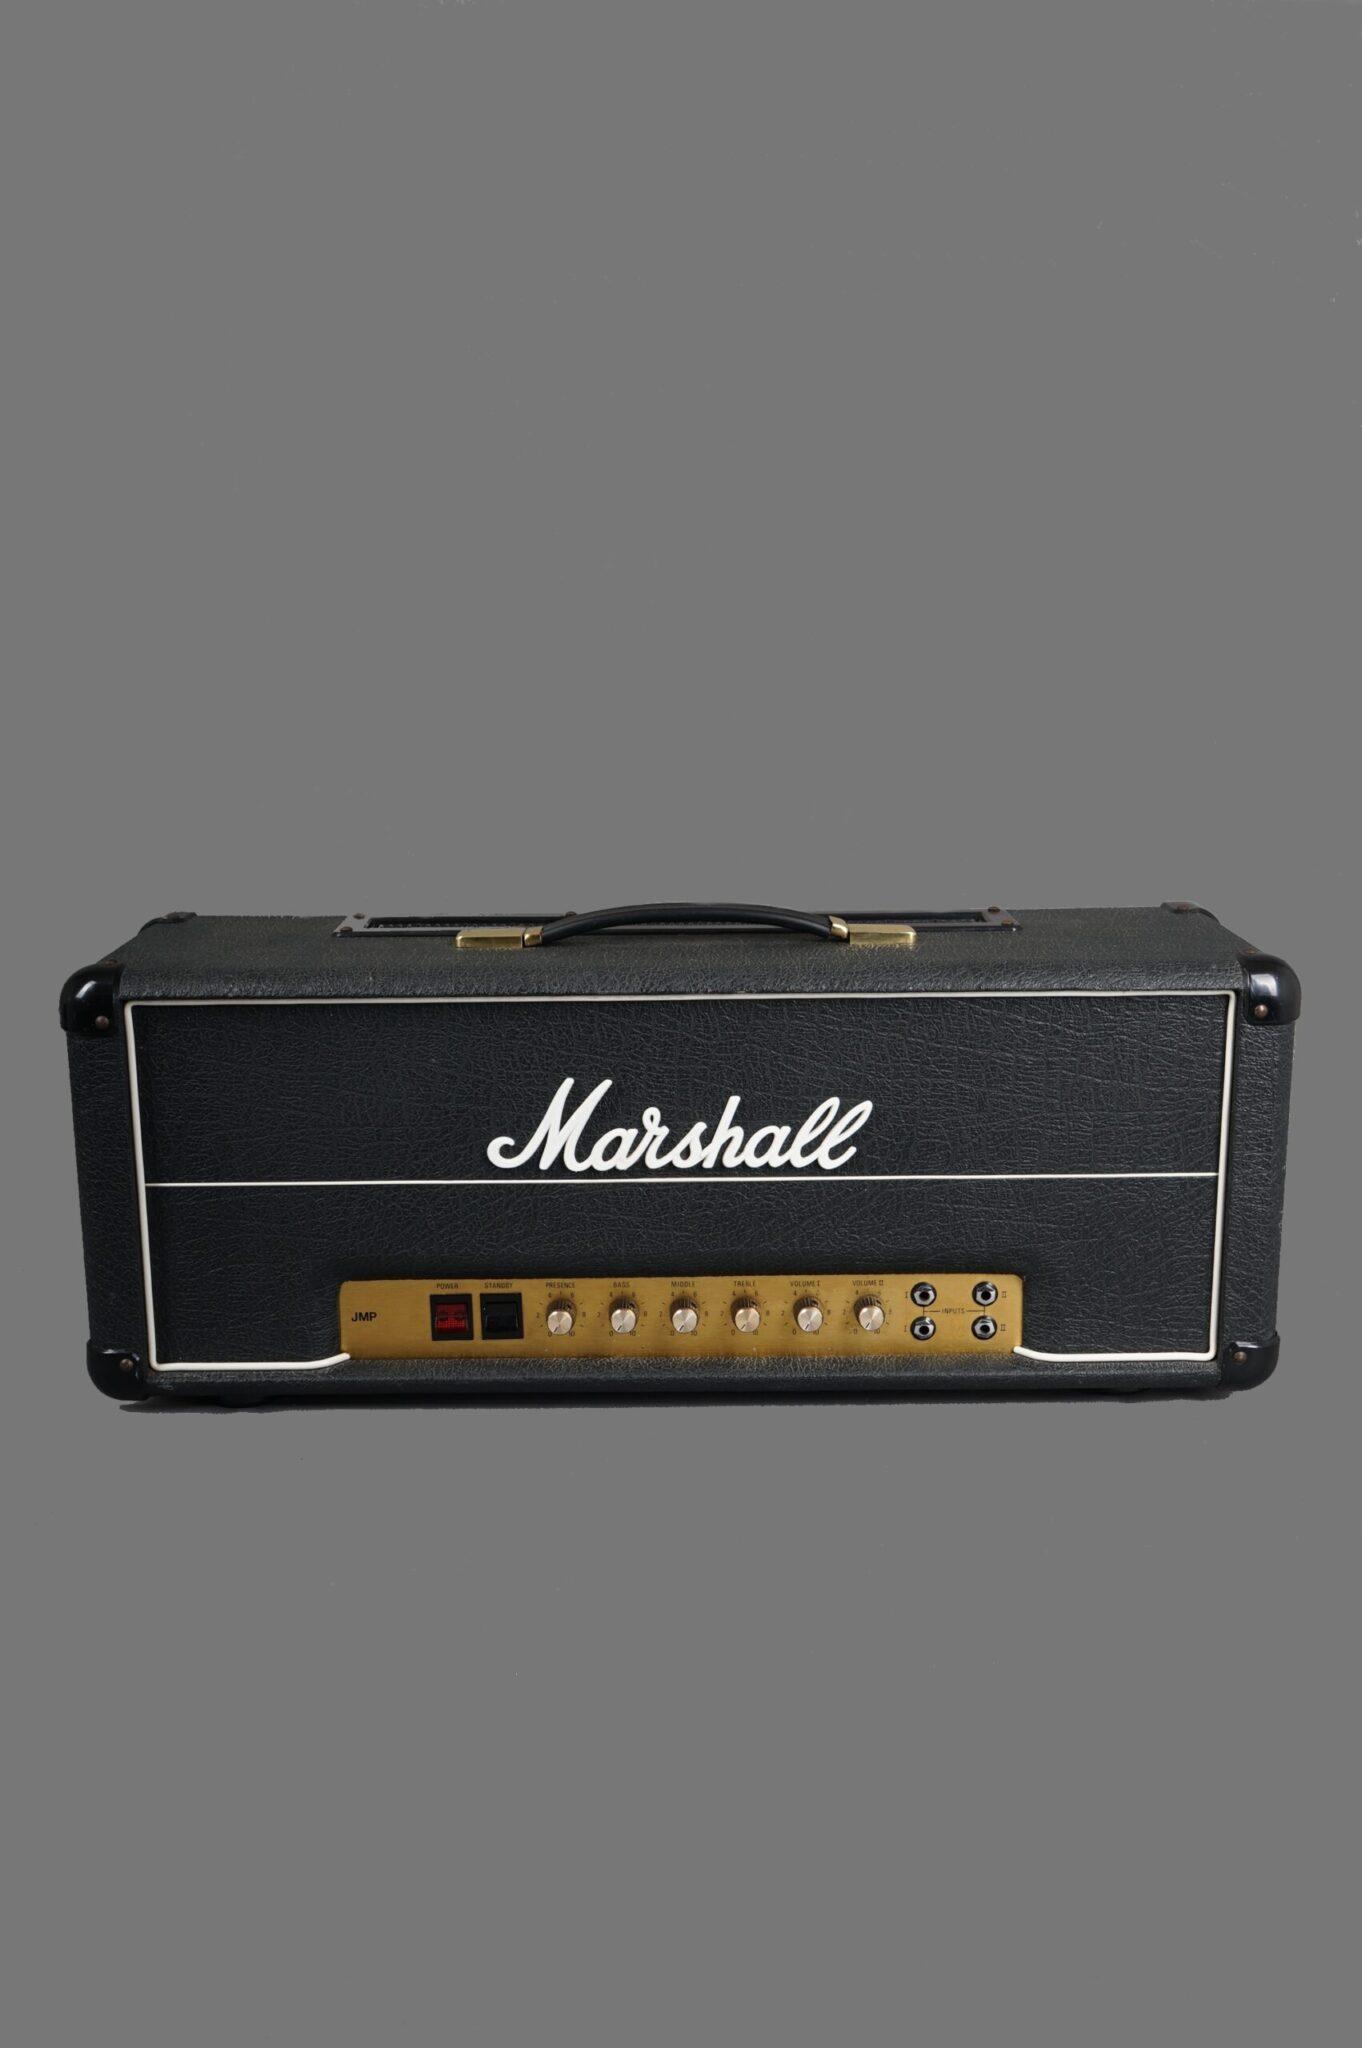 https://guitarpoint.de/app/uploads/products/1976-marshall-1959-super-lead-mkii/1976-Marshall-MK2-Super-Lead-09490J-1-scaled-1362x2048.jpg